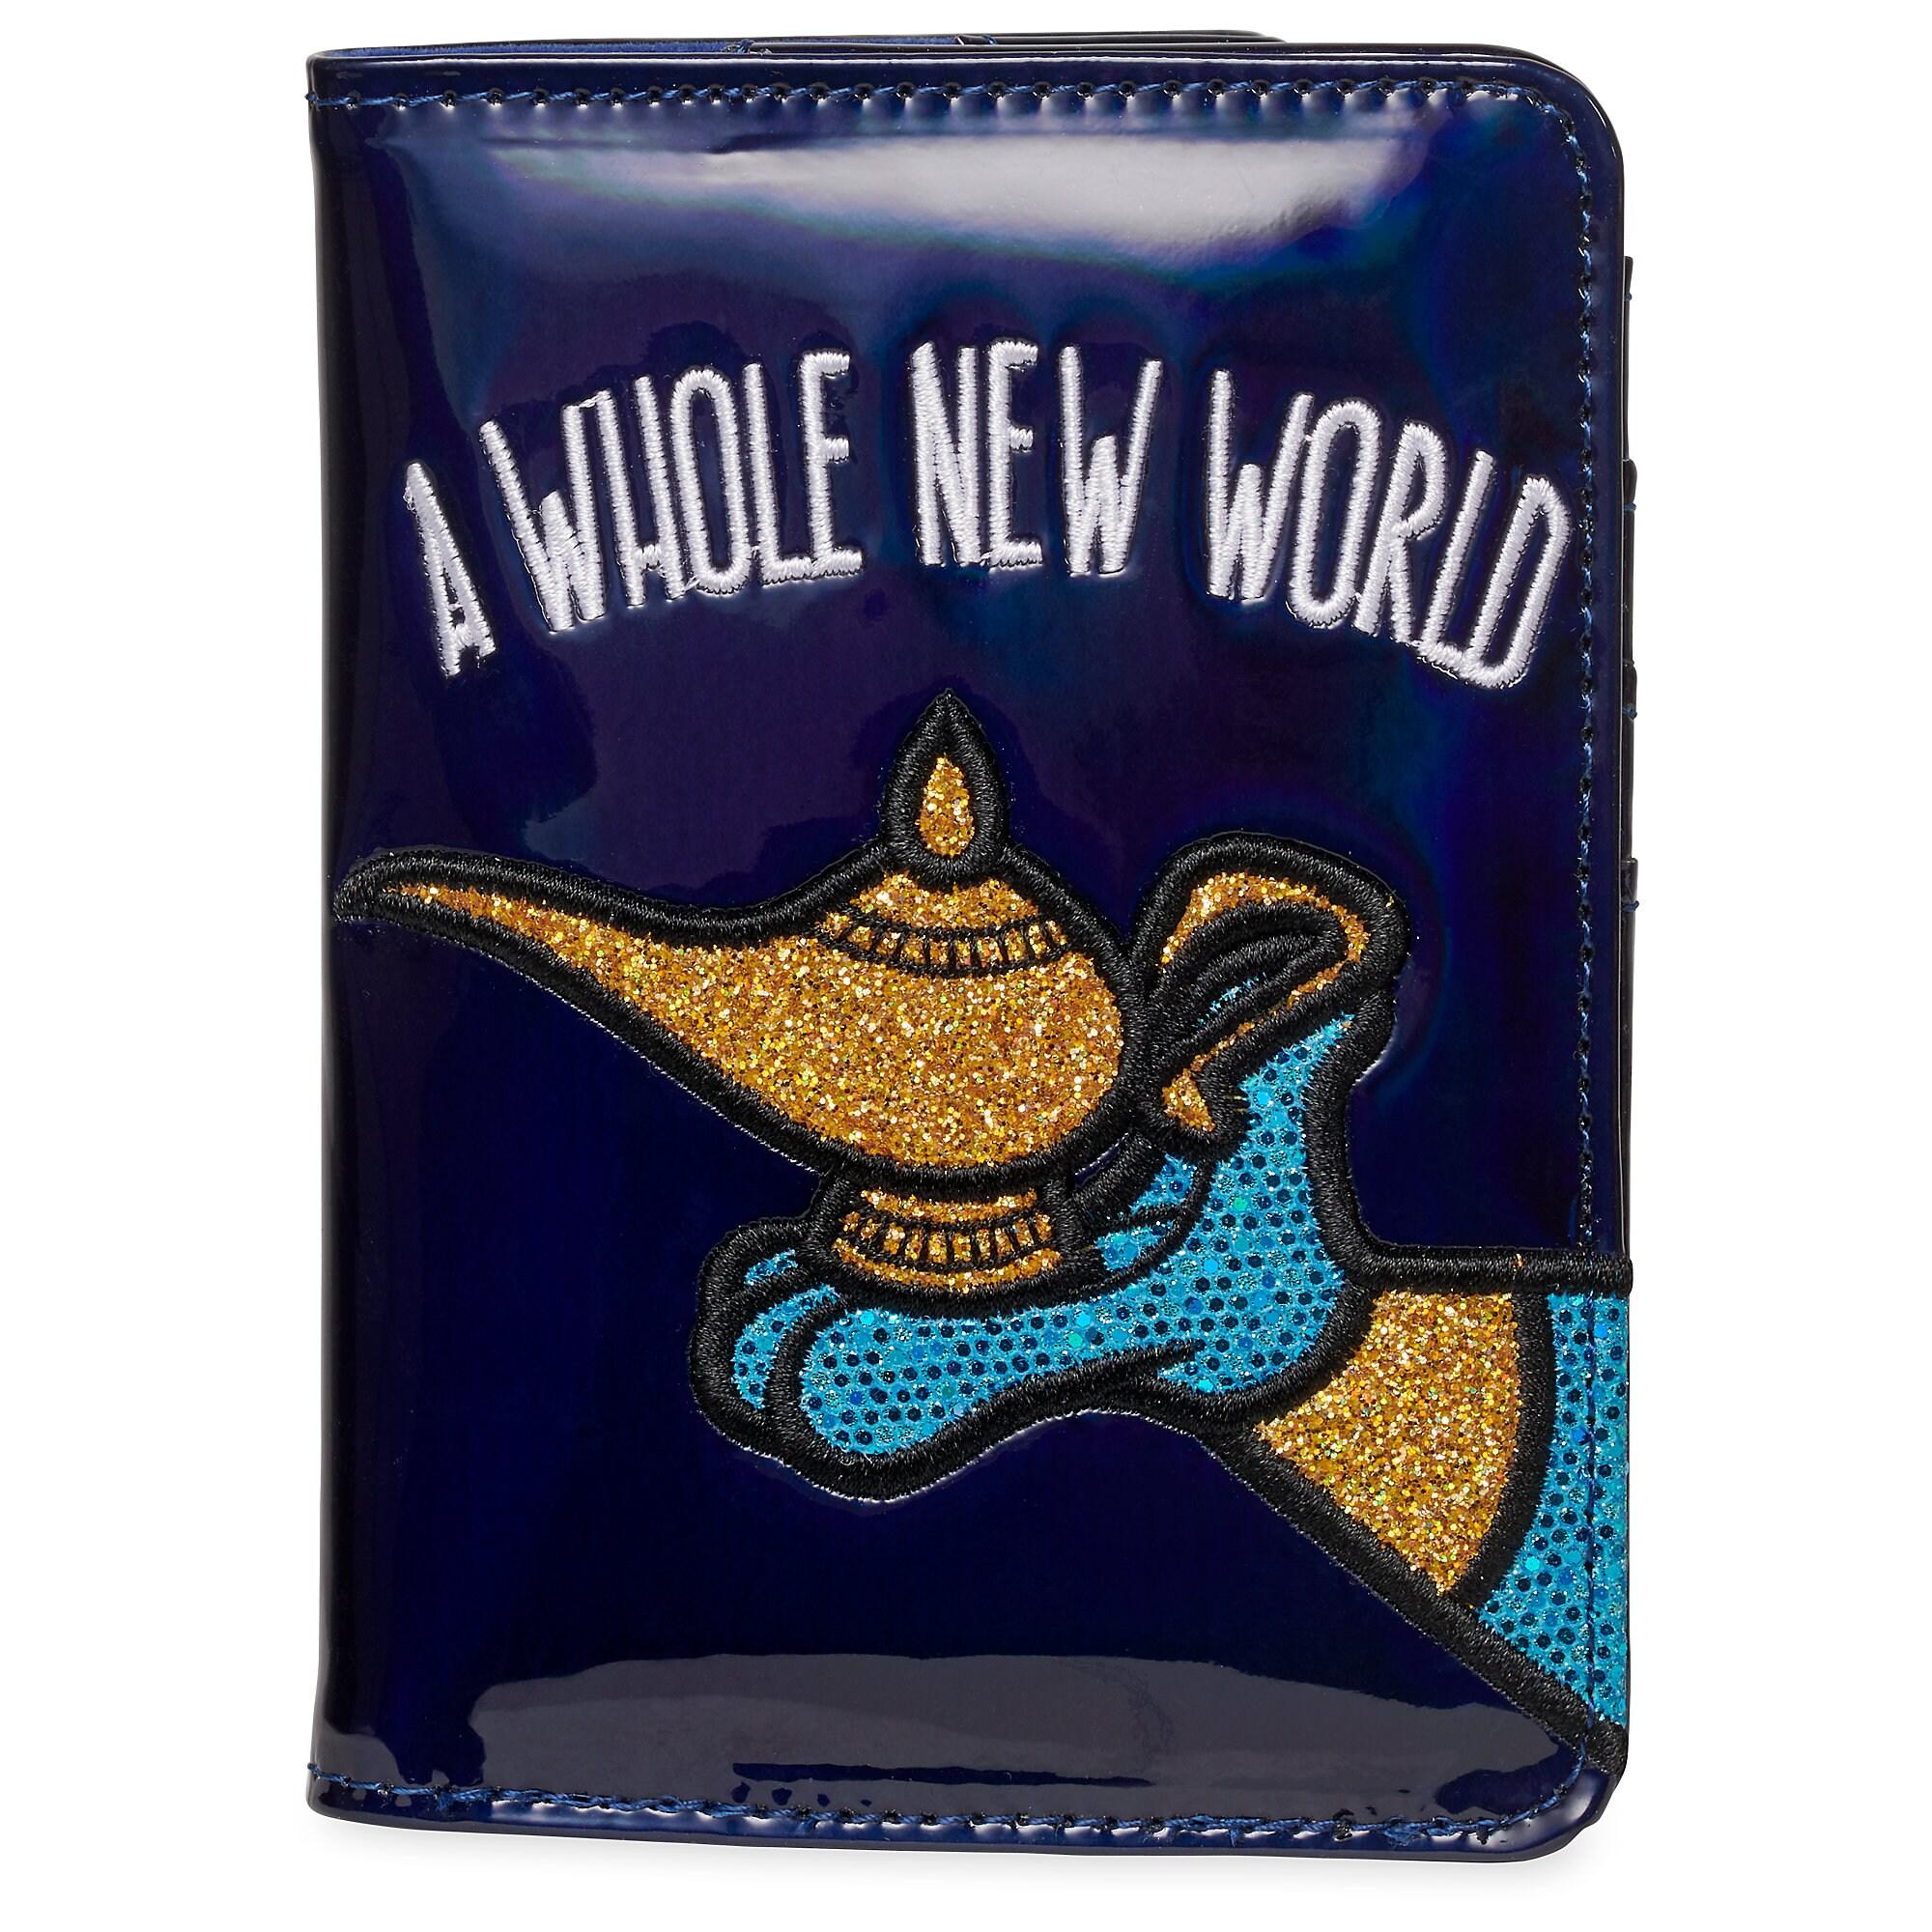 Genie Passport Holder for Adults by Danielle Nicole - Aladdin